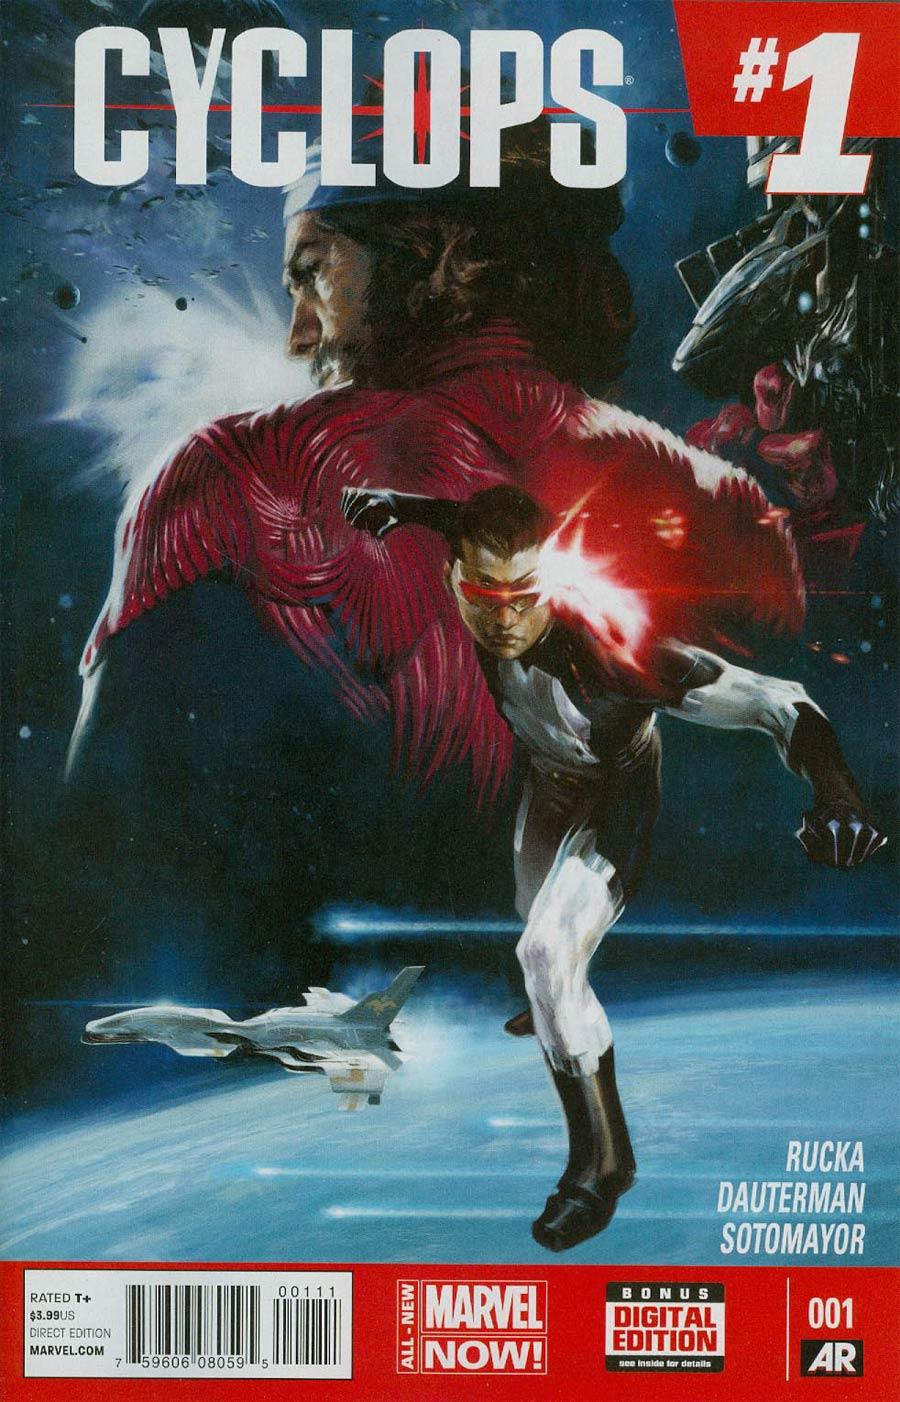 Cyclops Vol 2 #1 Cover A Regular Alexander Lozano Cover